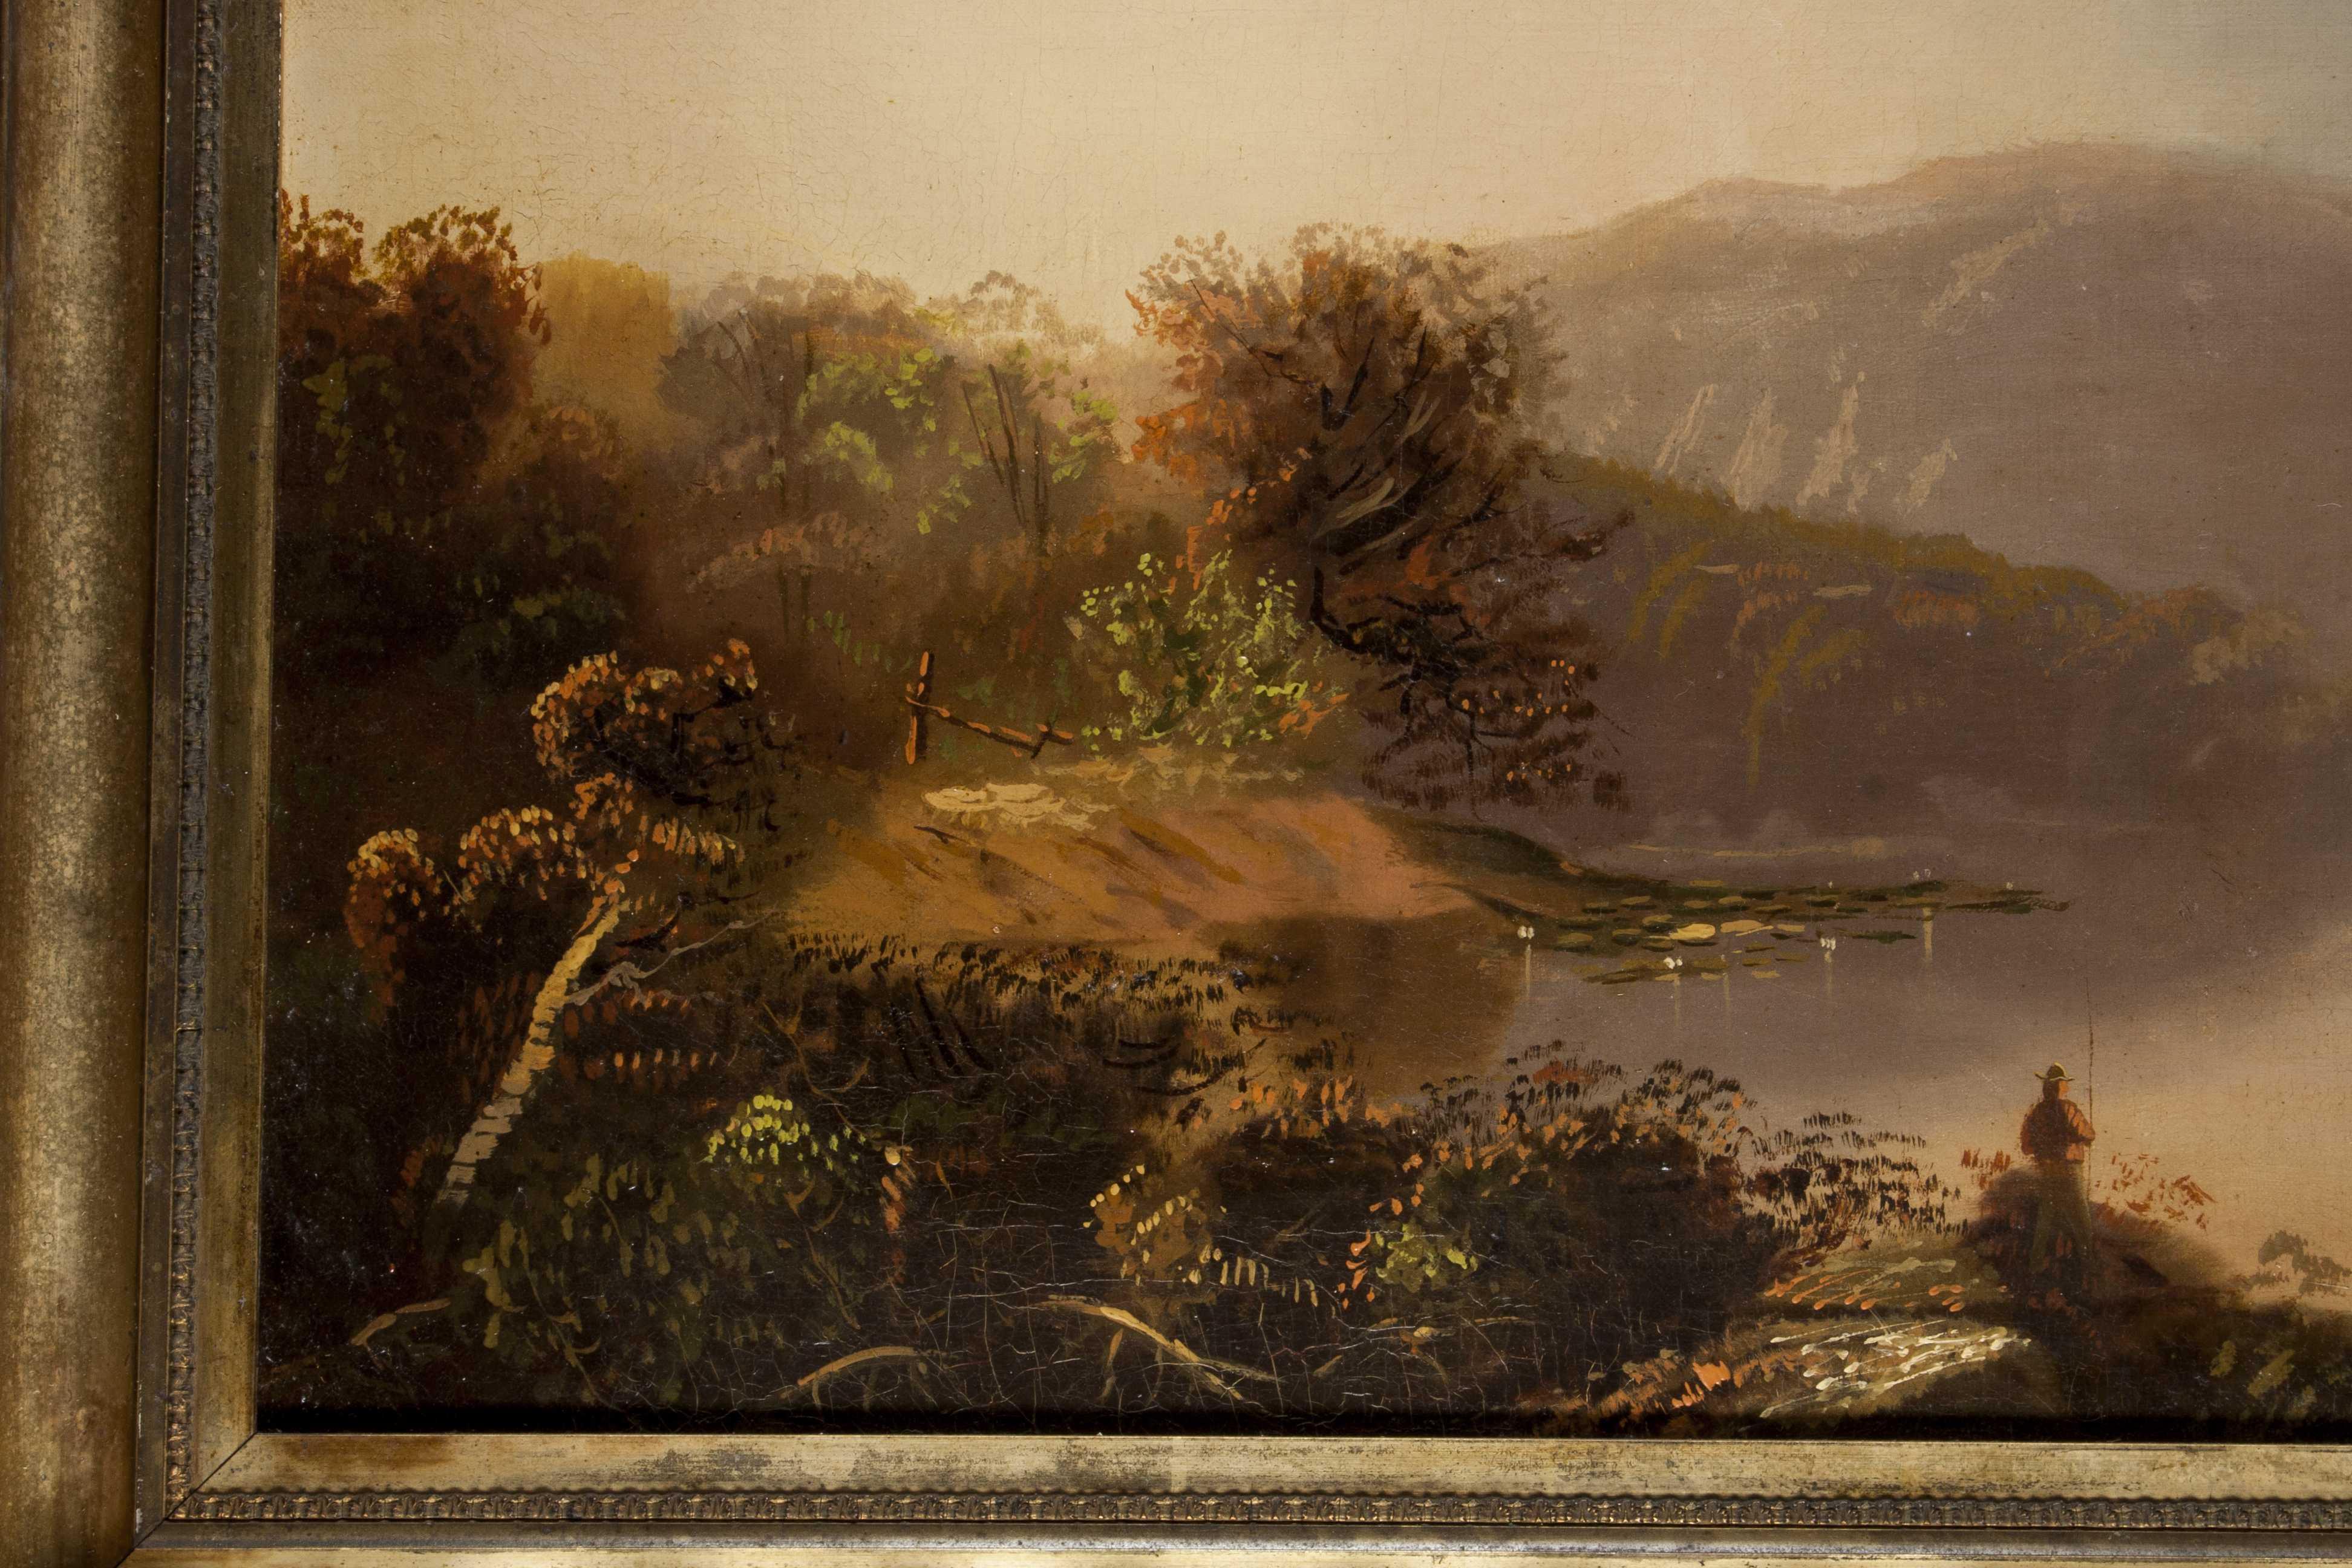 Hudson River School Landscape Of A Man Fishing